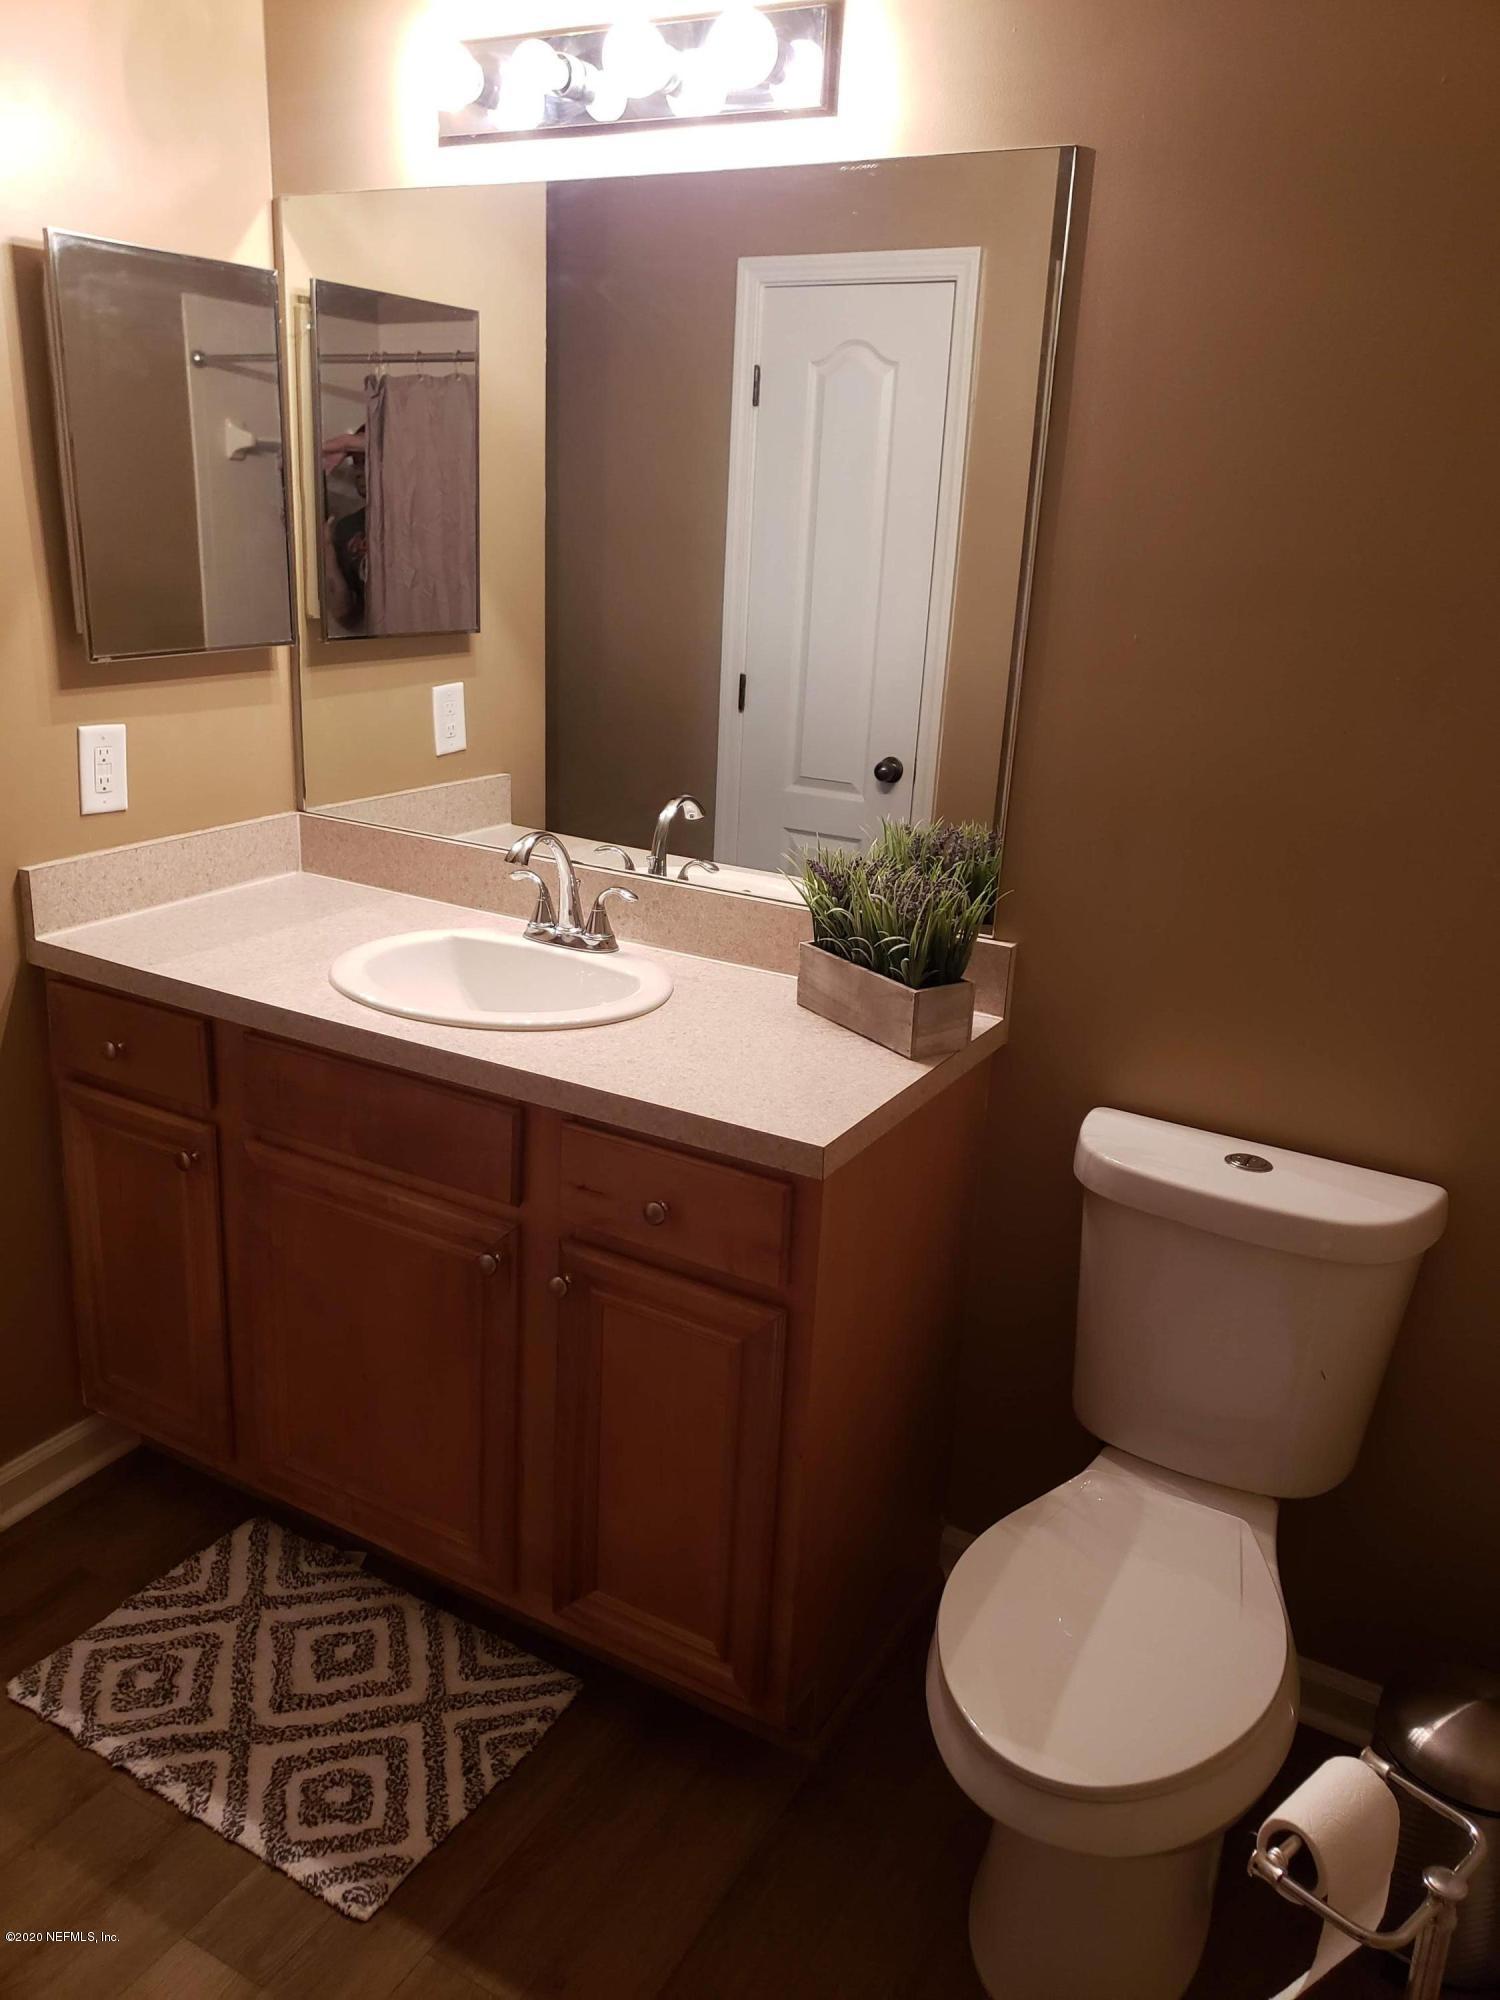 3750 SILVER BLUFF, ORANGE PARK, FLORIDA 32065, 2 Bedrooms Bedrooms, ,2 BathroomsBathrooms,Residential,For sale,SILVER BLUFF,1081016